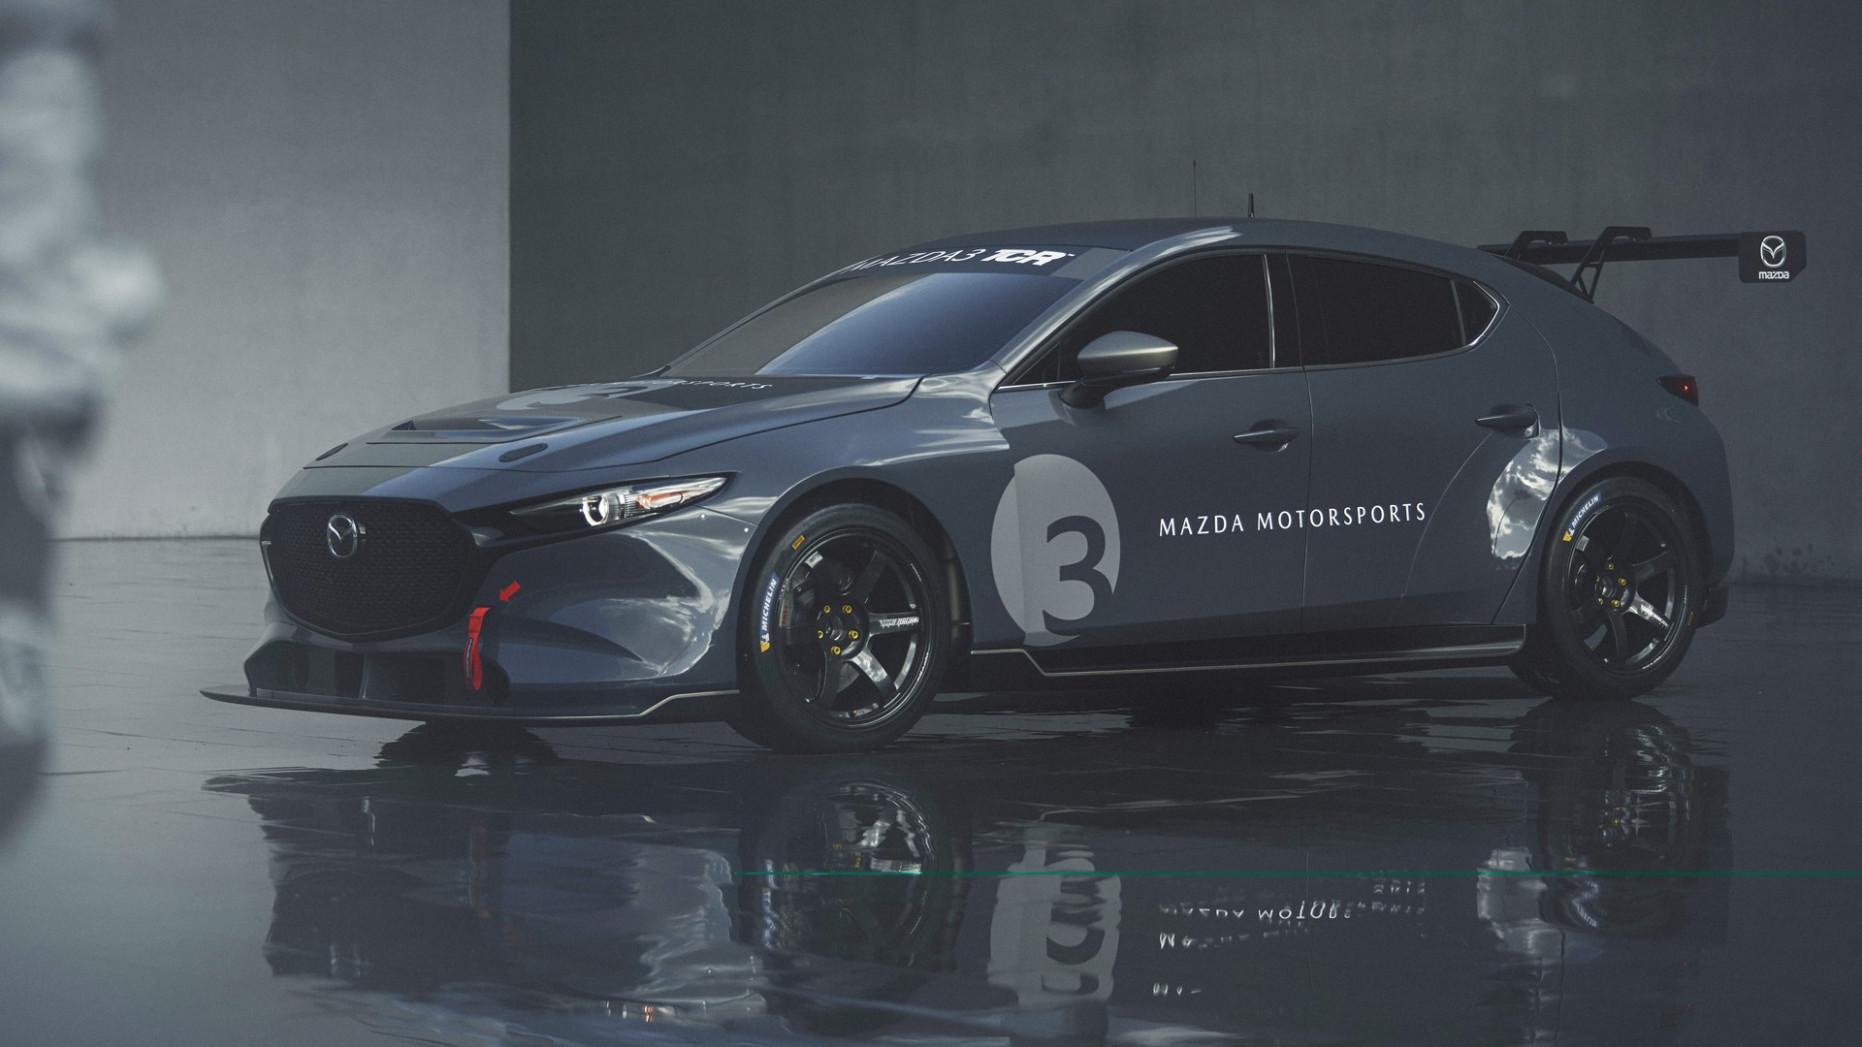 Model 2022 Mazdaspeed 3